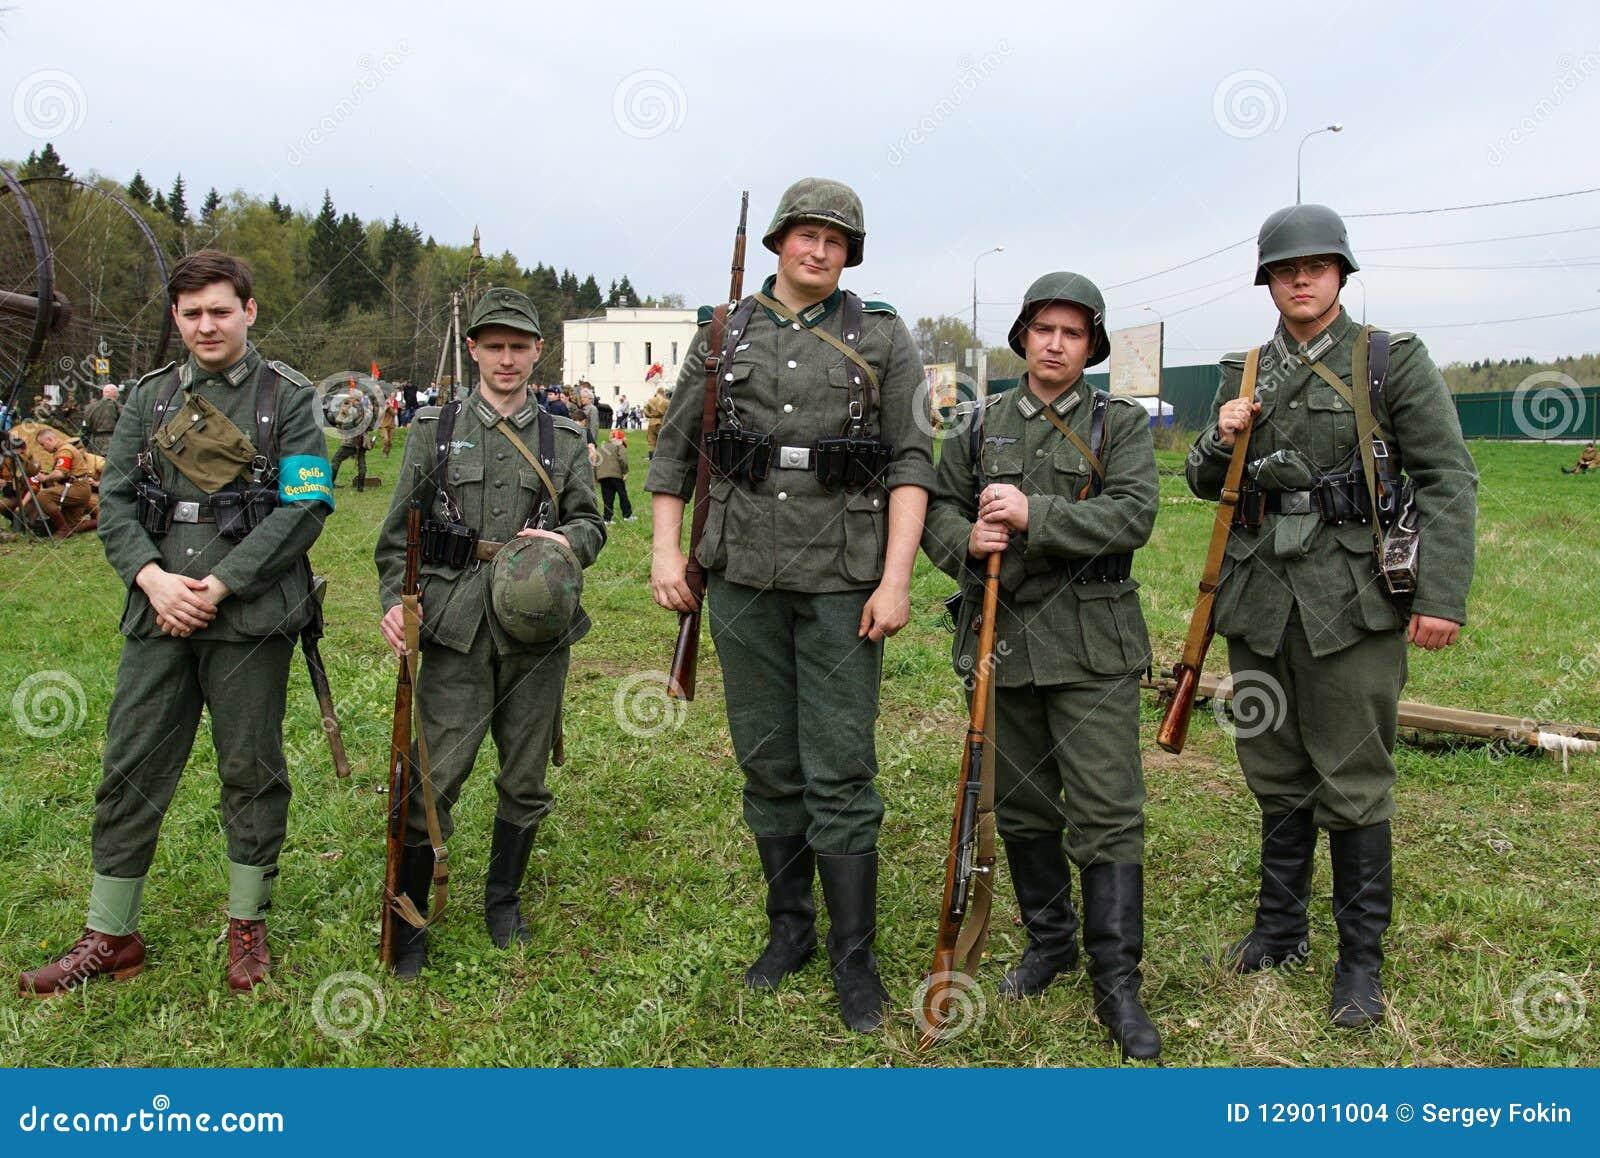 Reenactment Of World War II Events  Editorial Stock Image - Image of